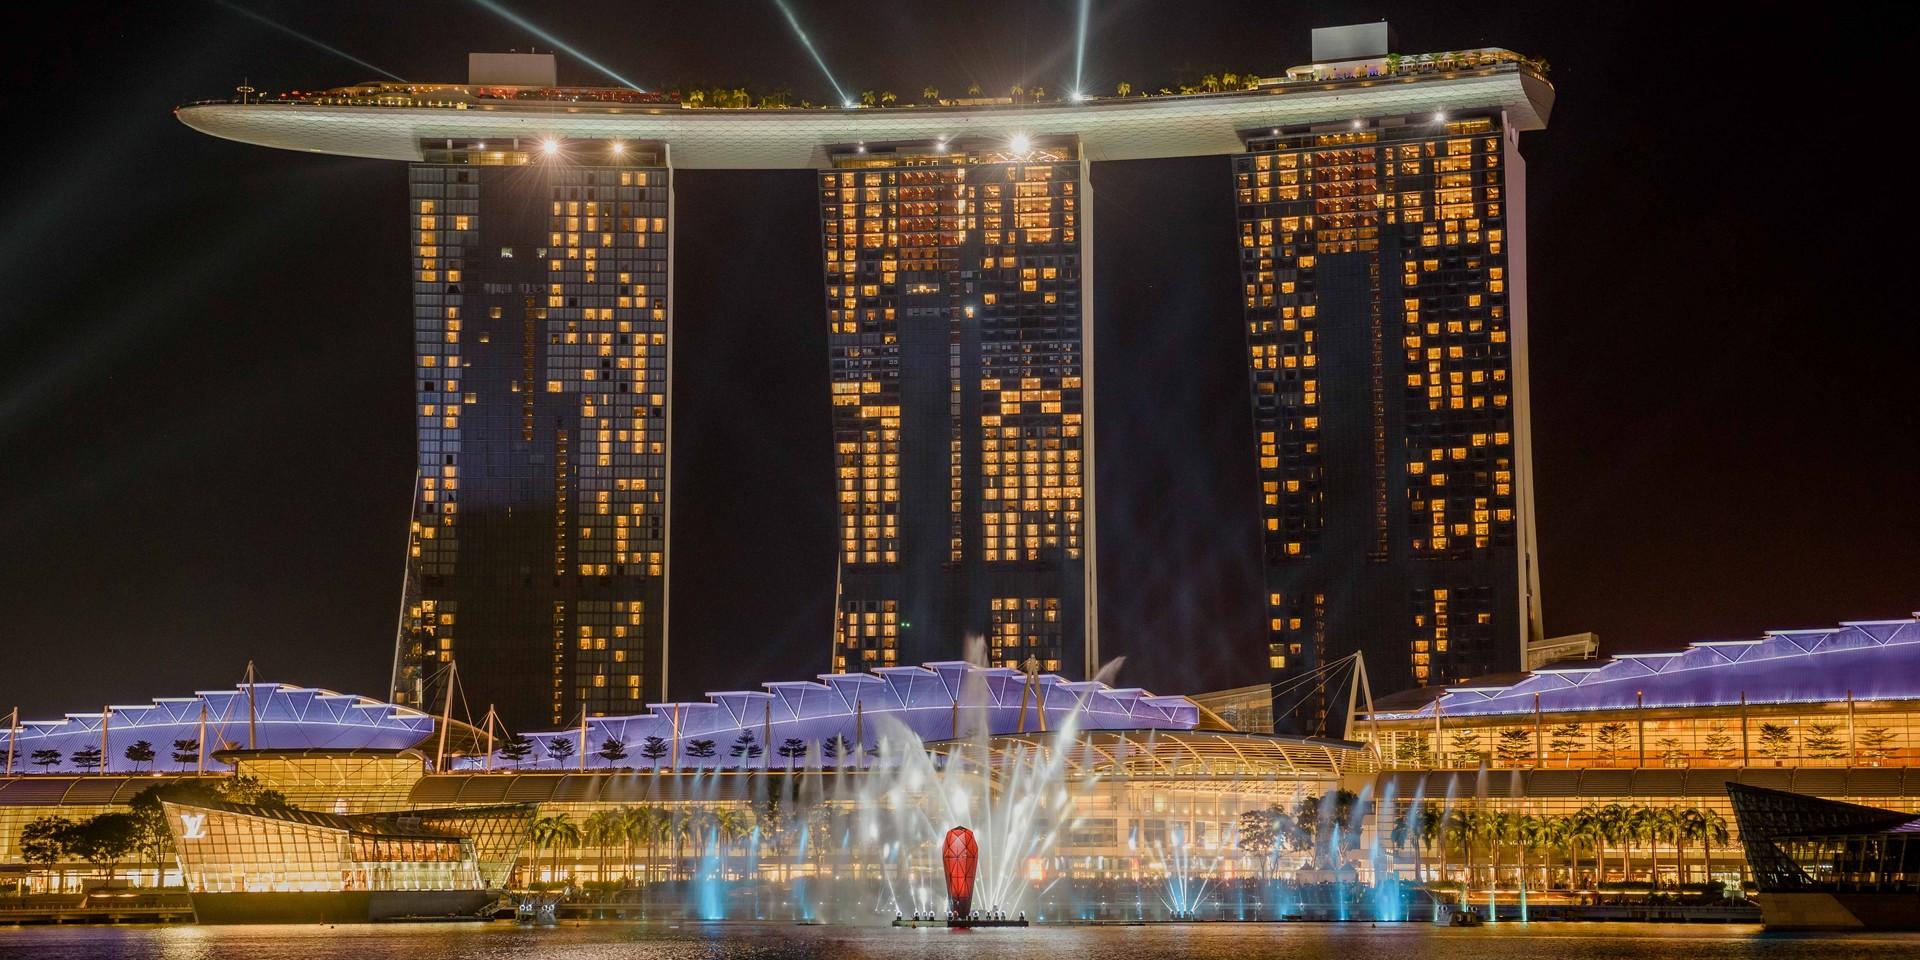 Marina Bay Sands announces unprecedented temporary closure